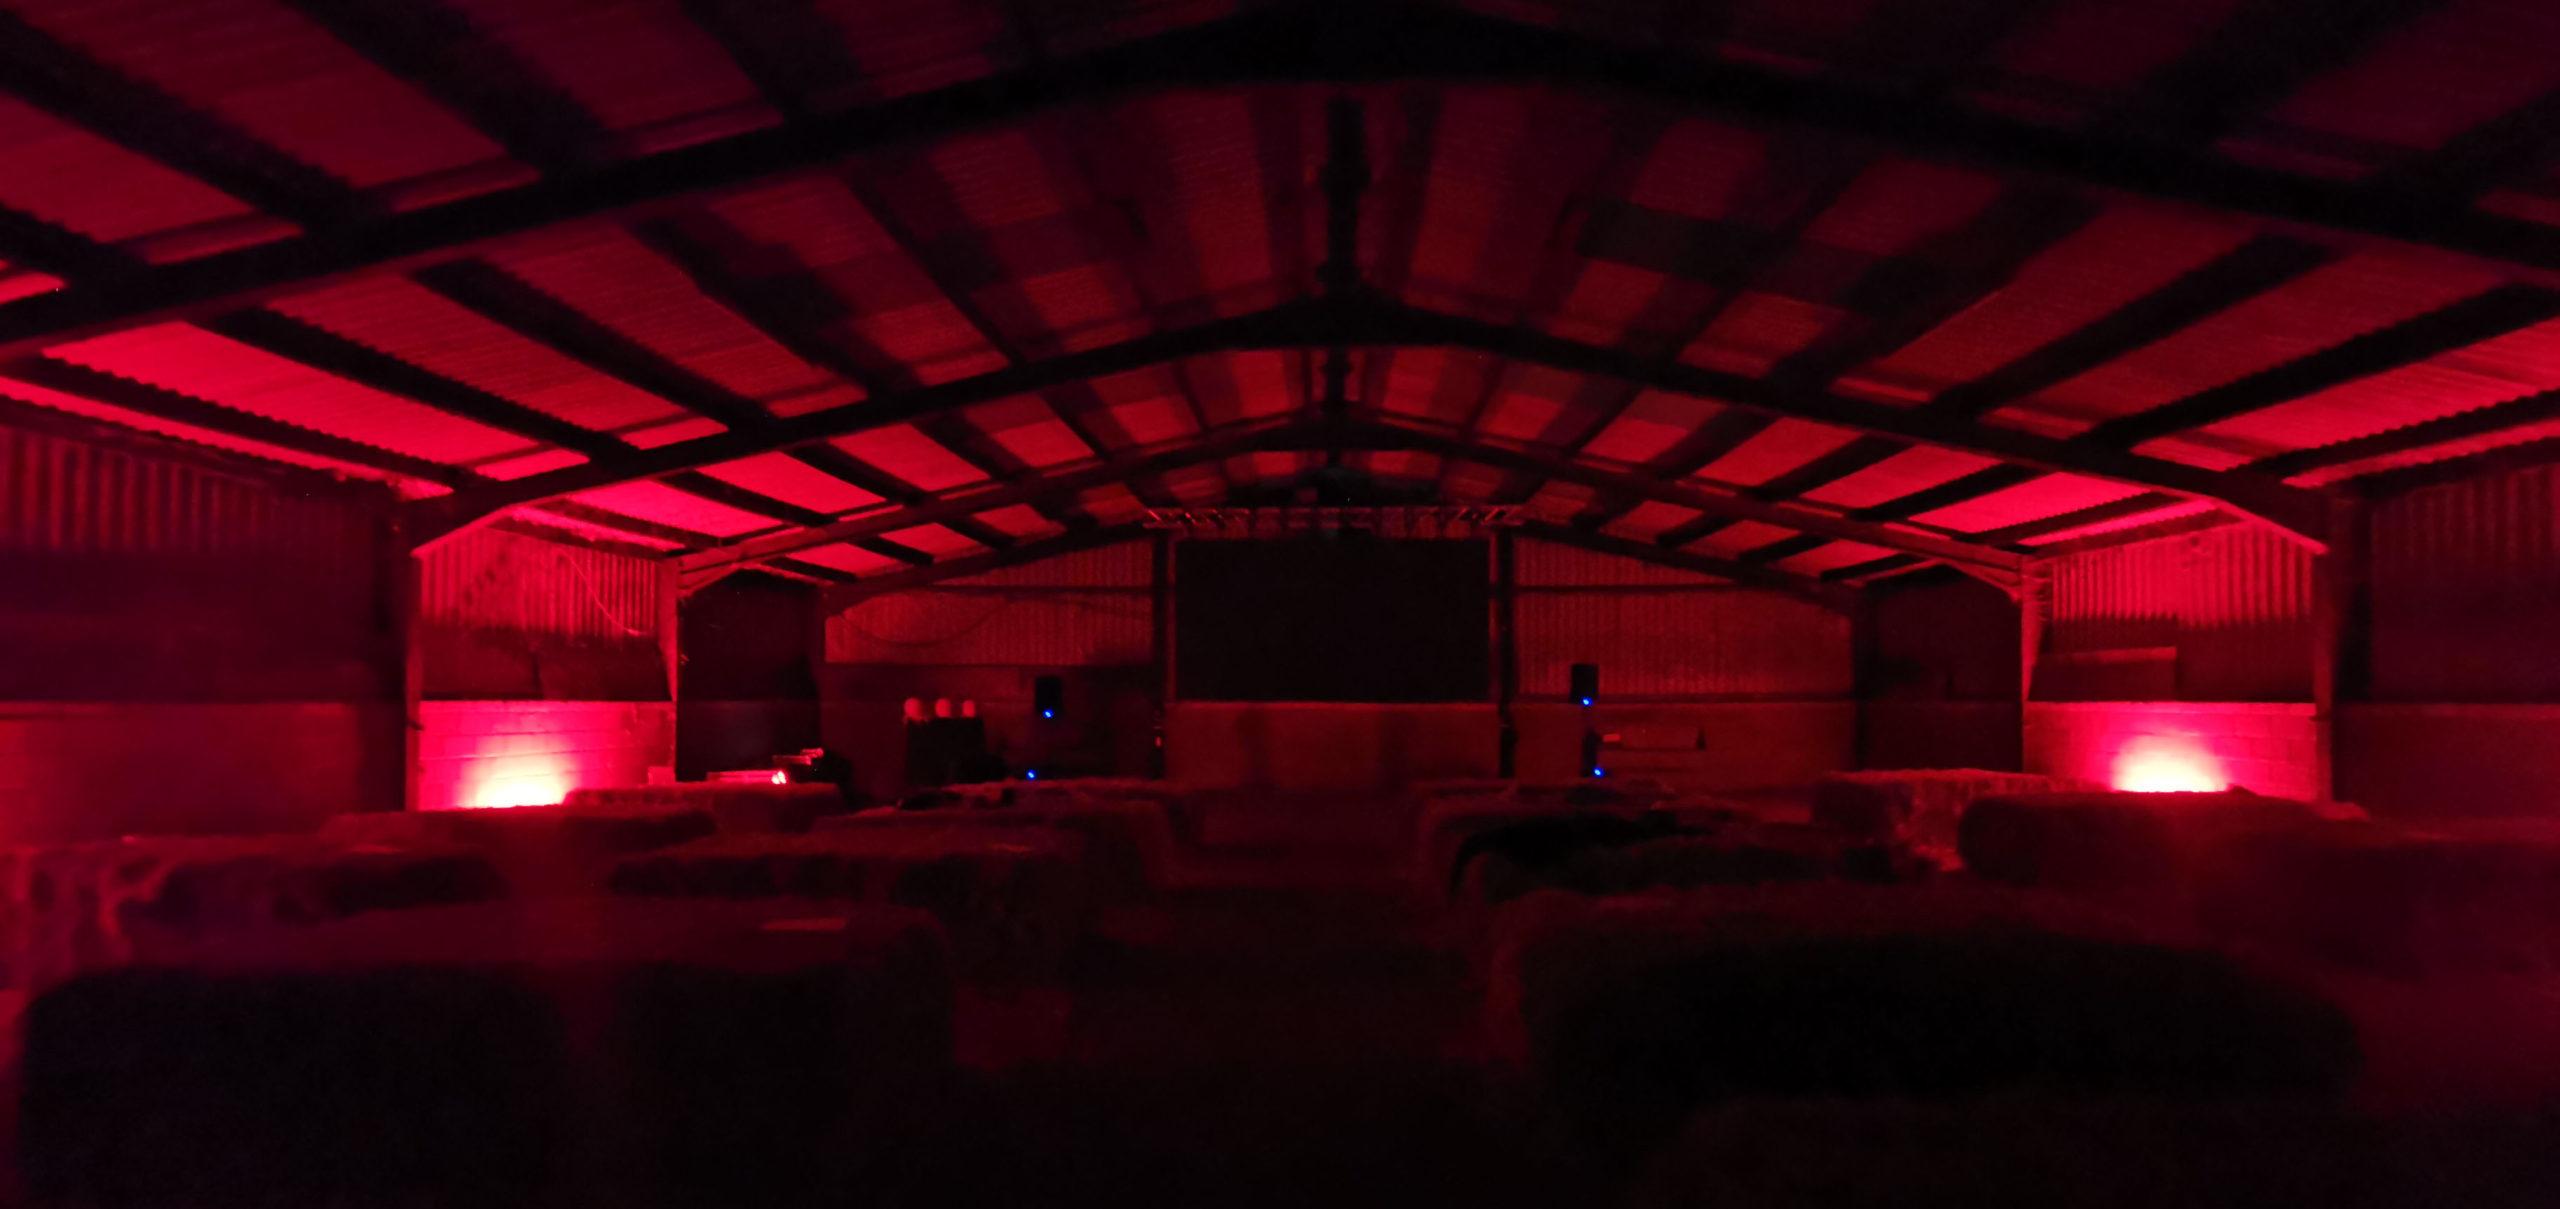 Spooky halloween barn red lighting